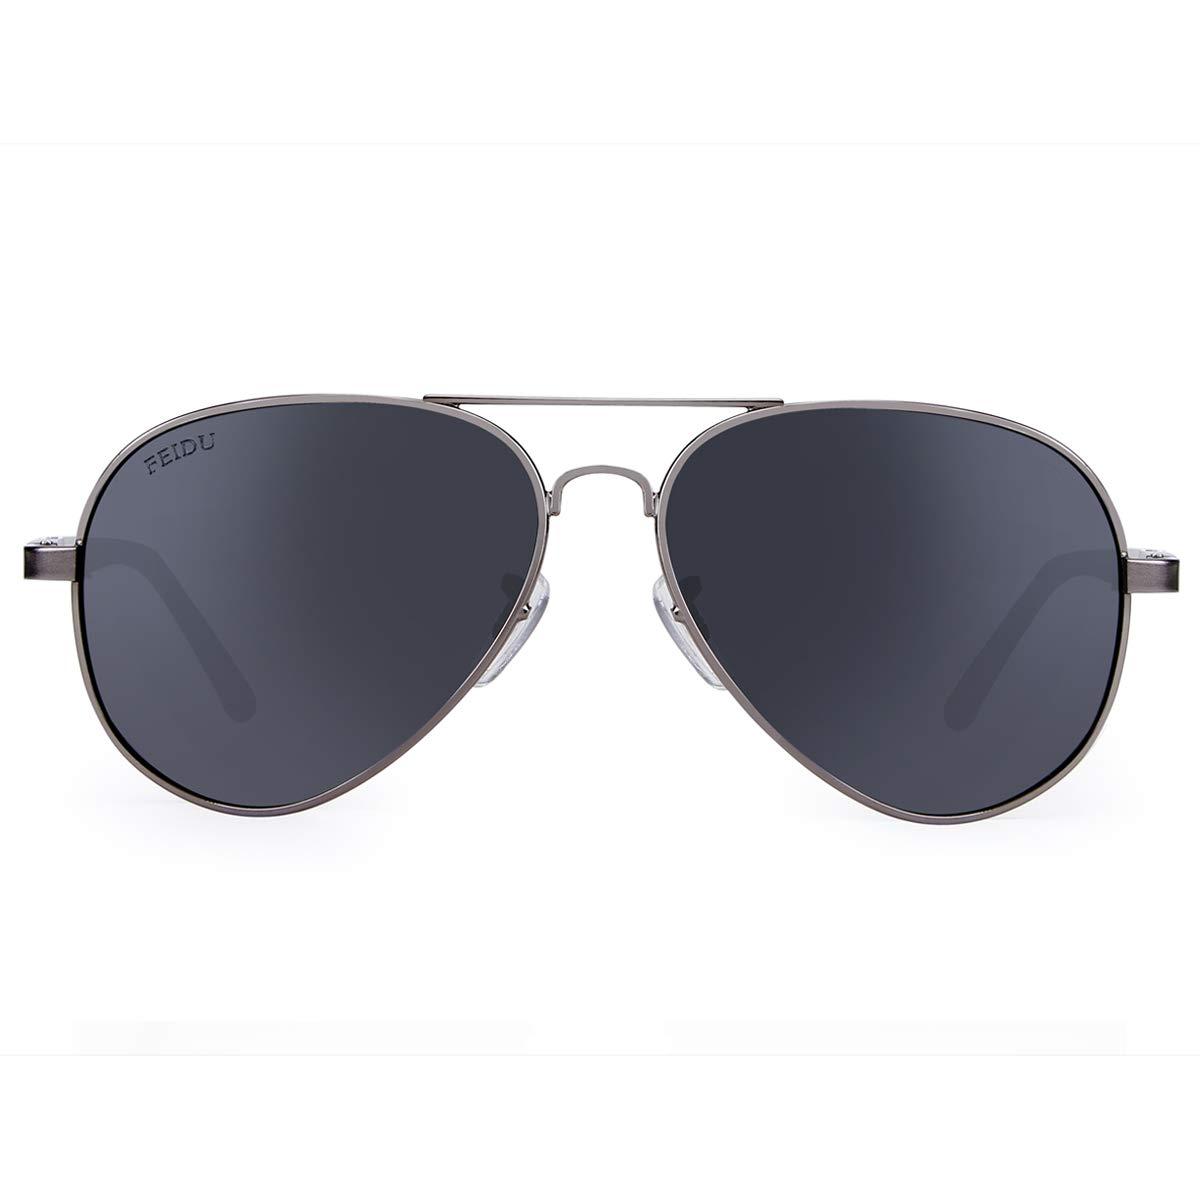 da3d5af38 Amazon.com: FEIDU Mens Polarized Aviator Sunglasses Metal Frame Unisex Sun  Glasses FD9001 (Black/Gun, 2.08): Clothing